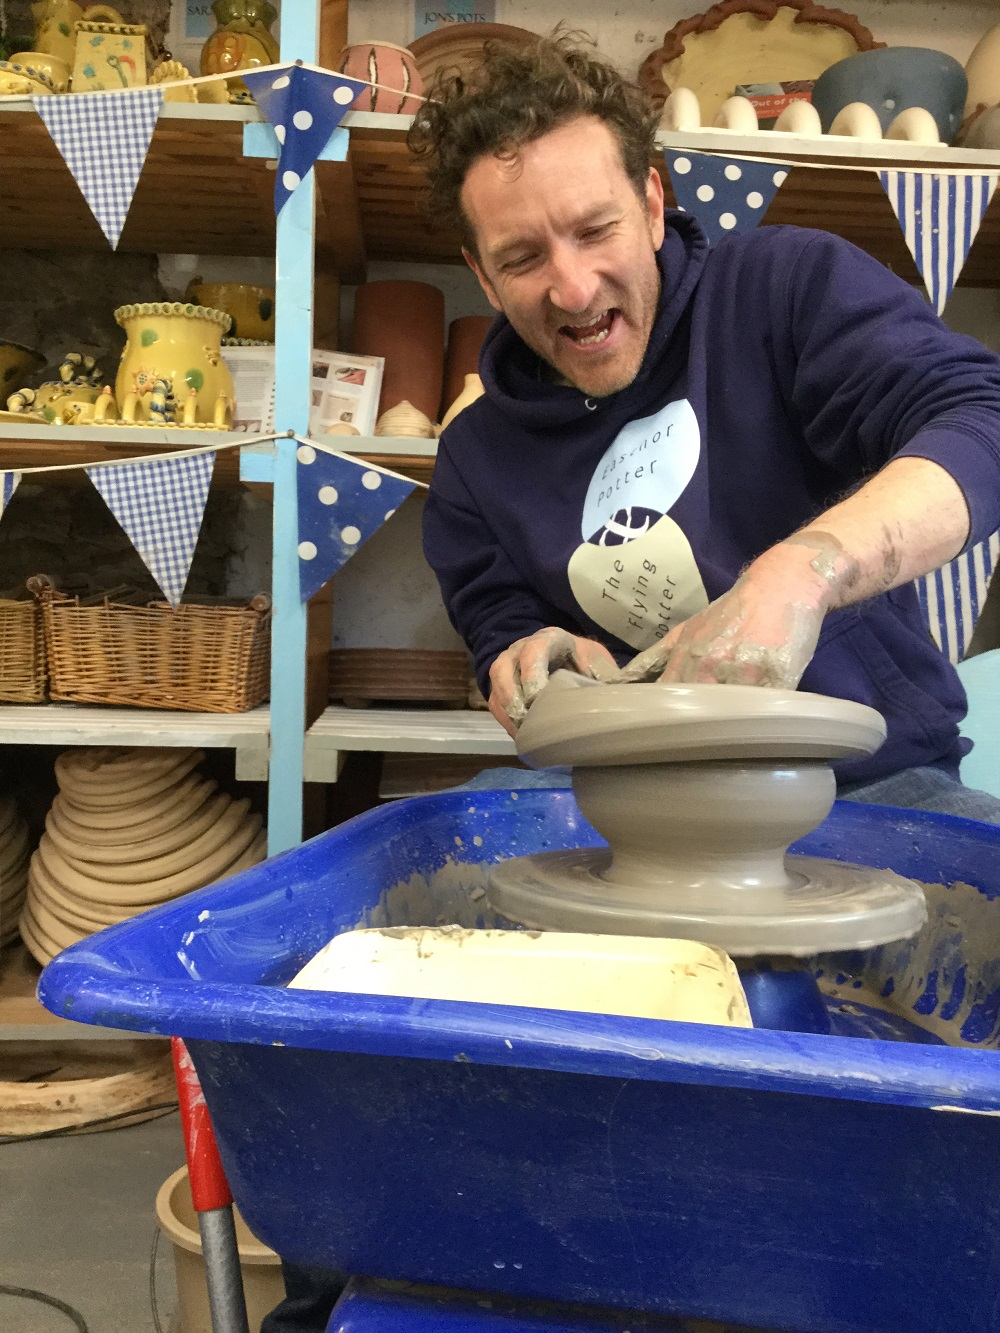 jon the potter making a very wobbly pot on the potter's wheel